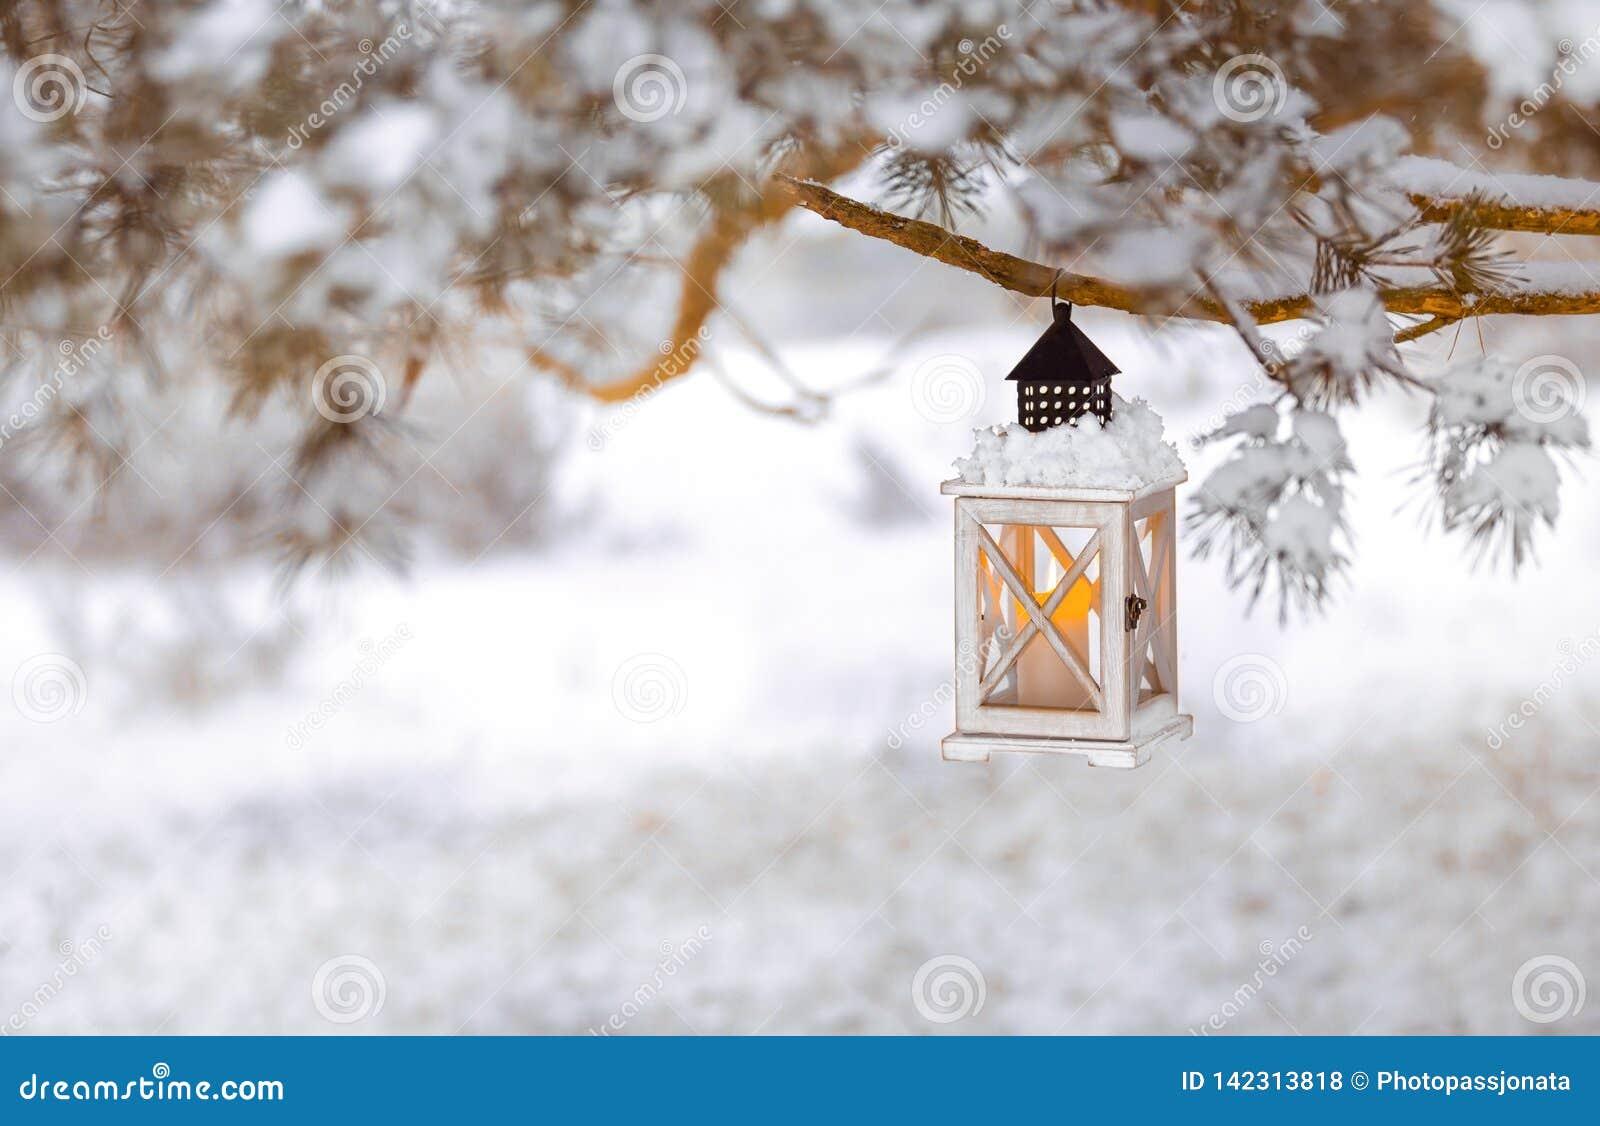 Фонарик со свечой на снежном дереве